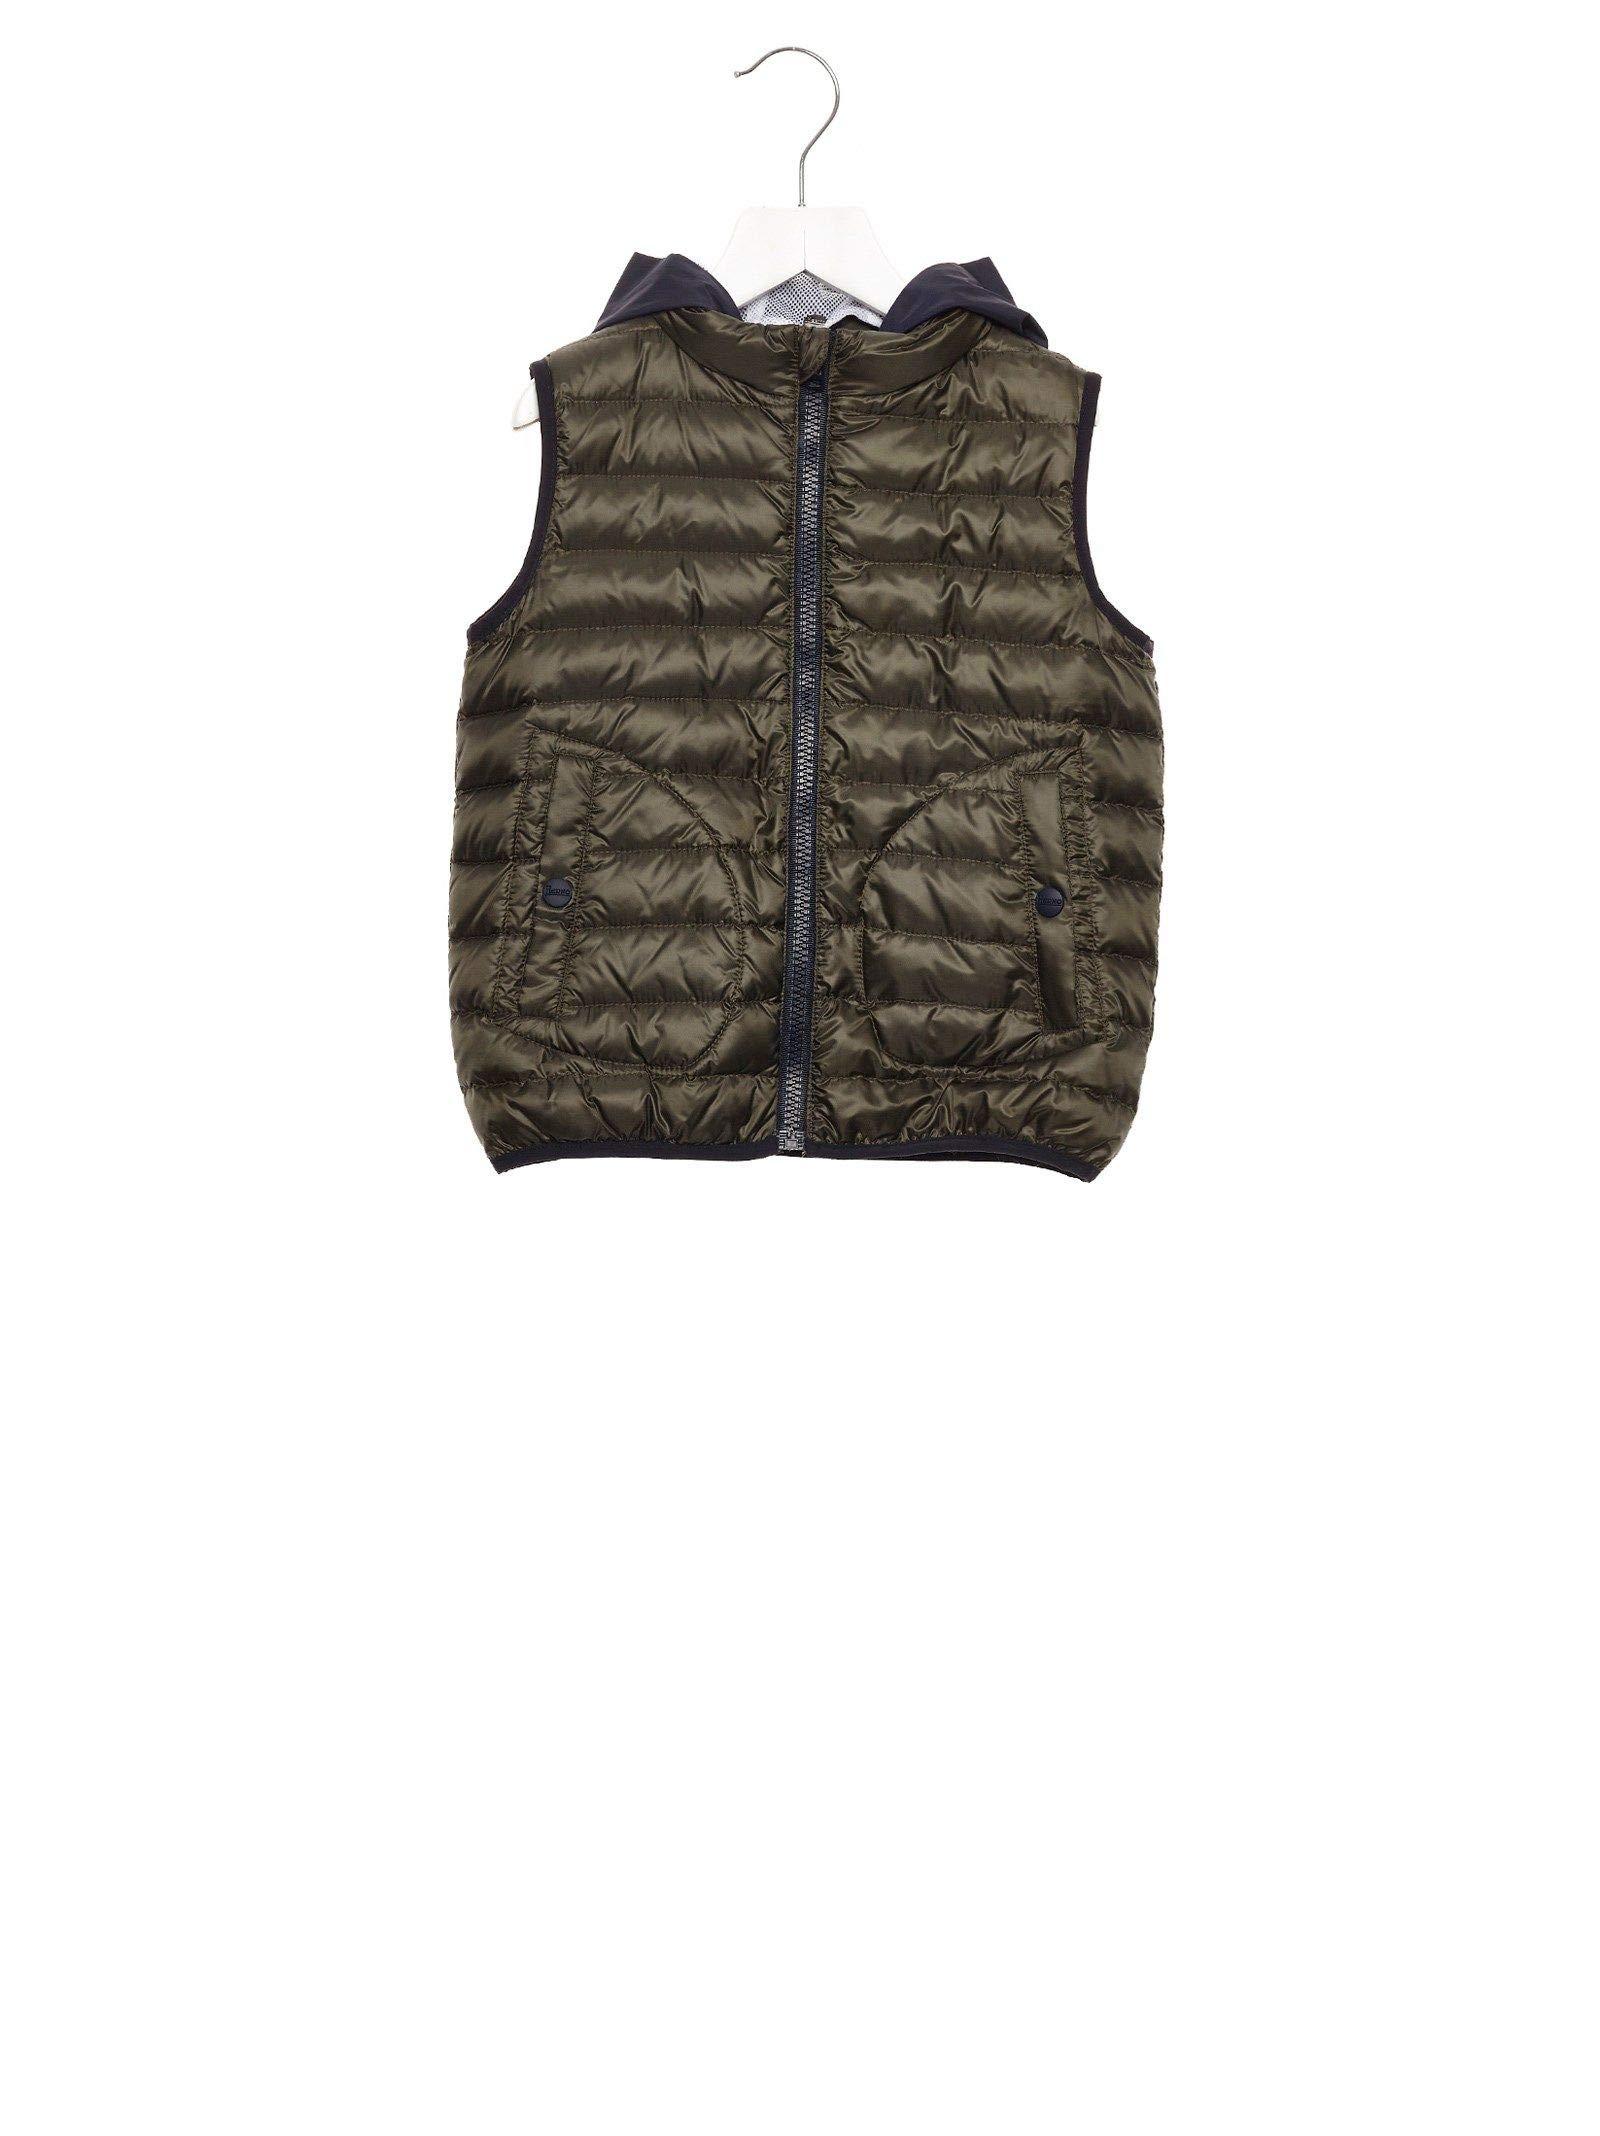 Herno Luxury Fashion Boys PI0042B120207400 Green Vest   Fall Winter 19 by Herno